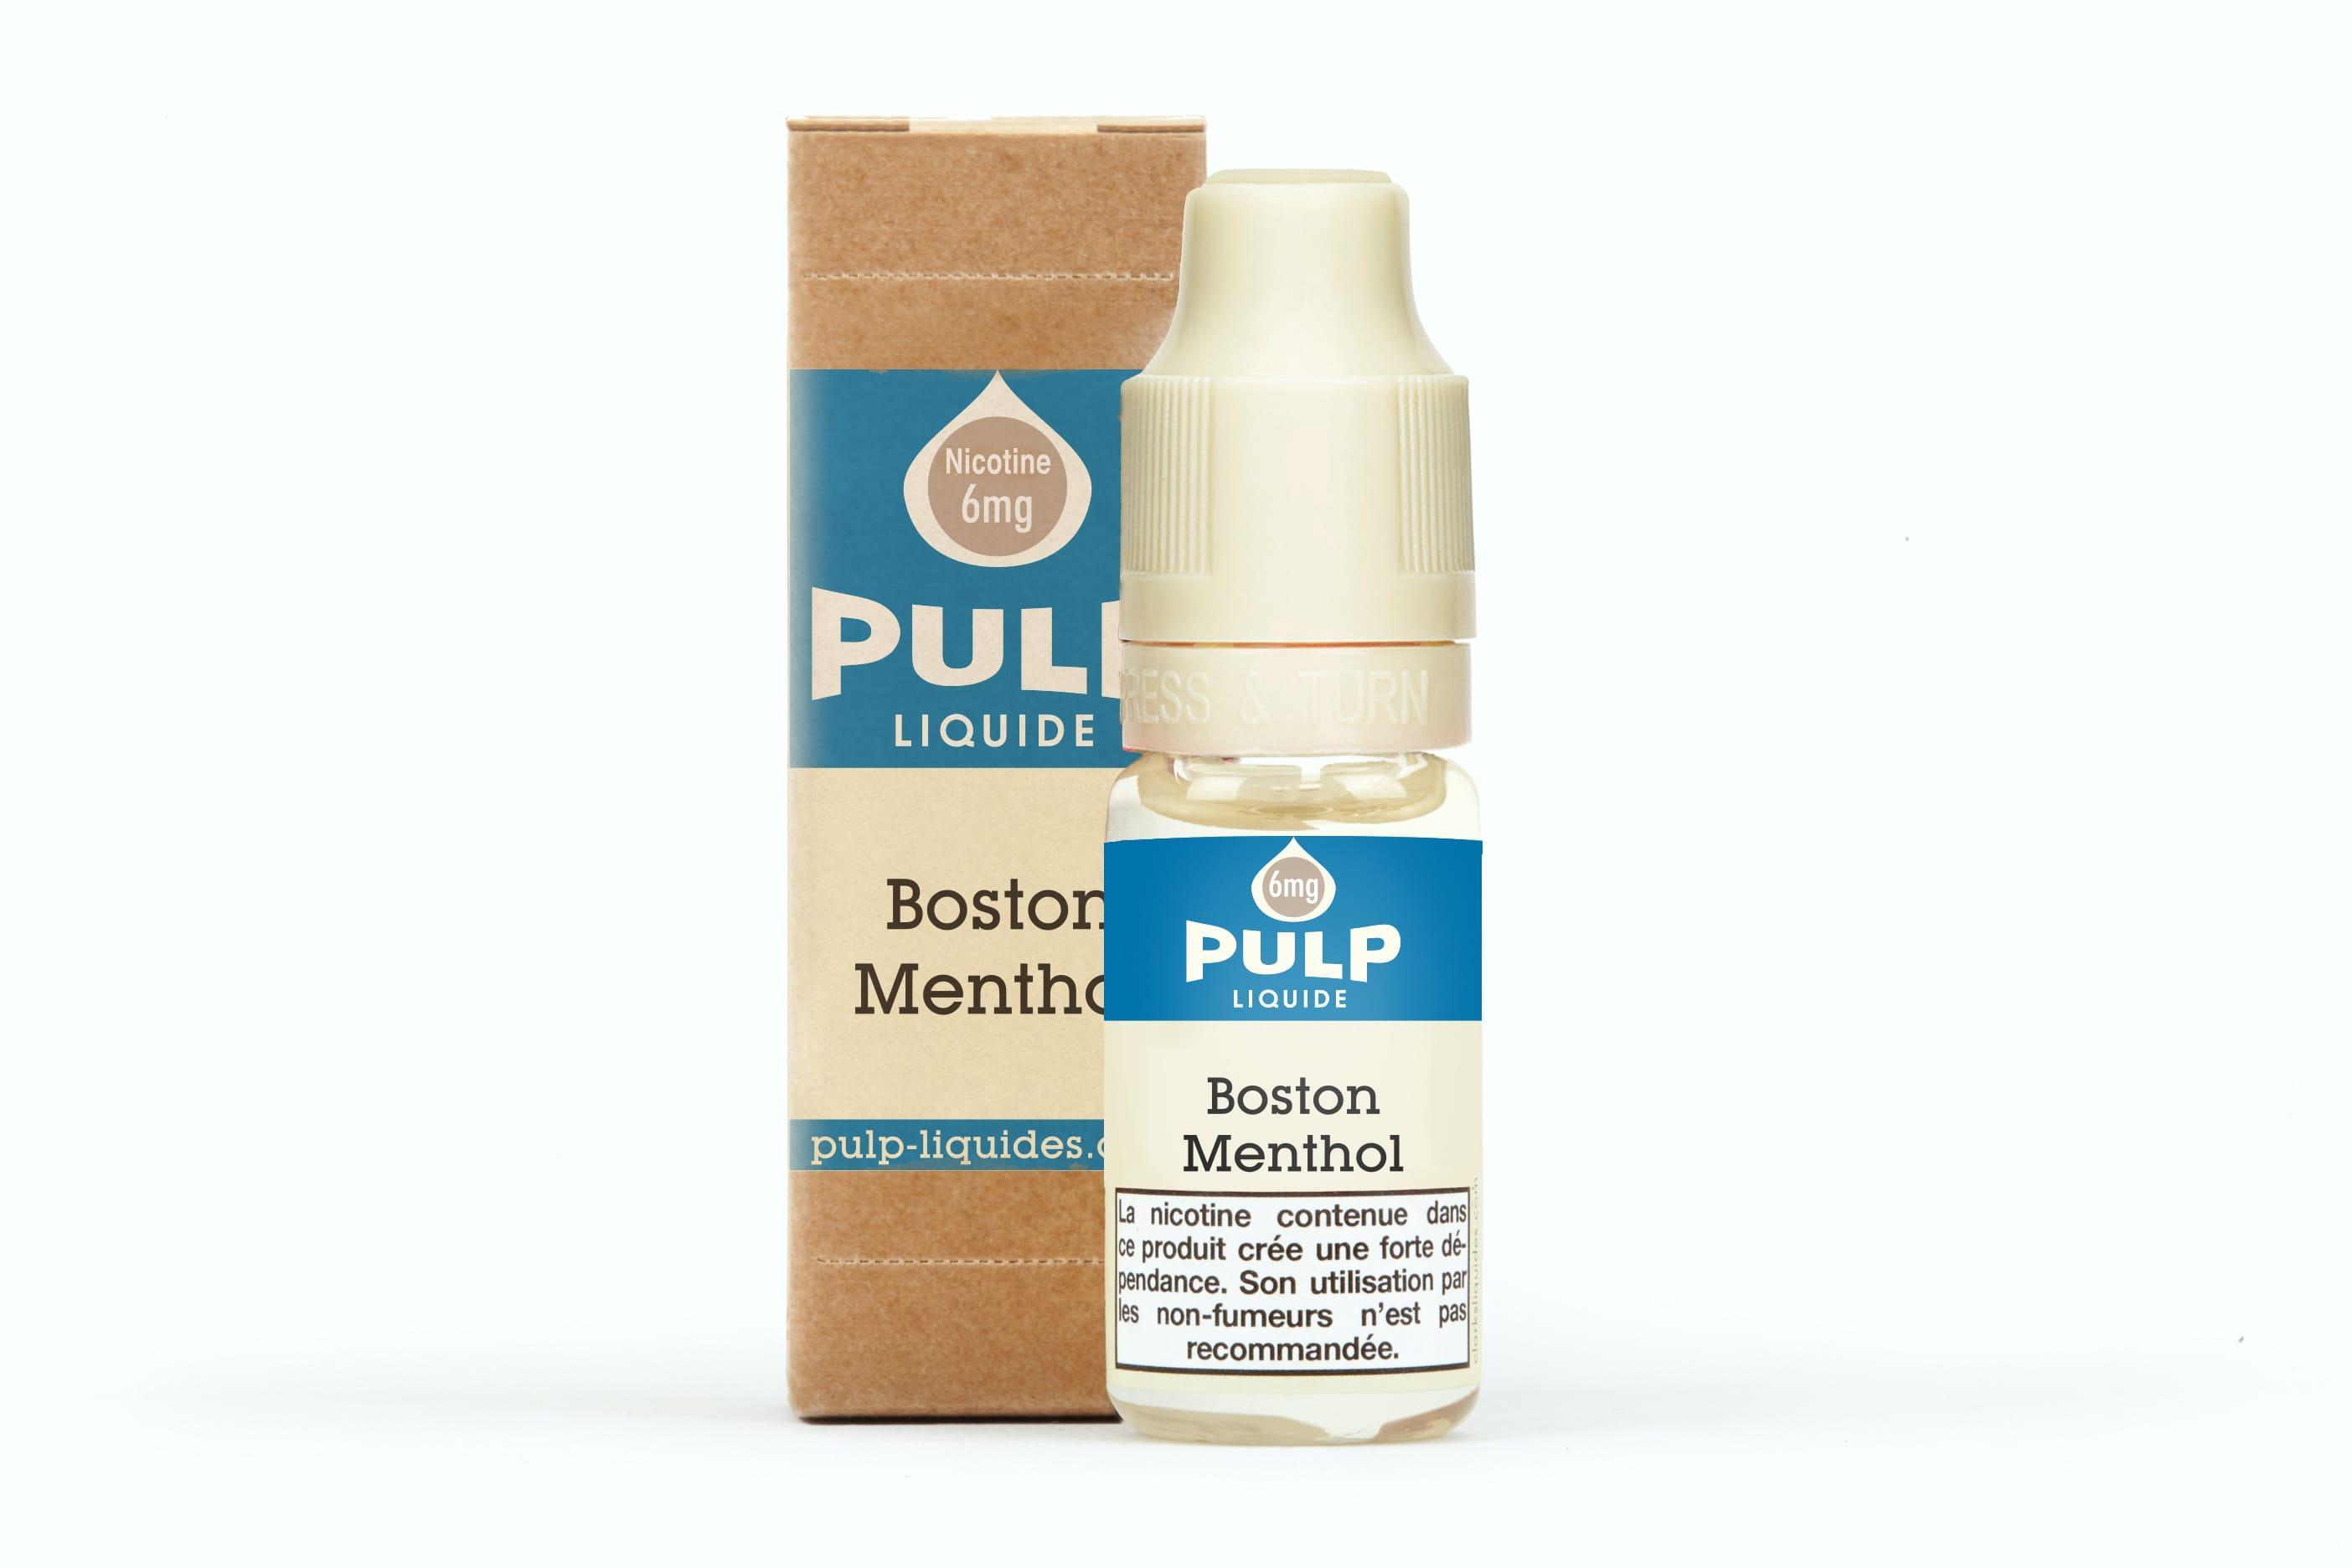 Boston Menthol Pulp